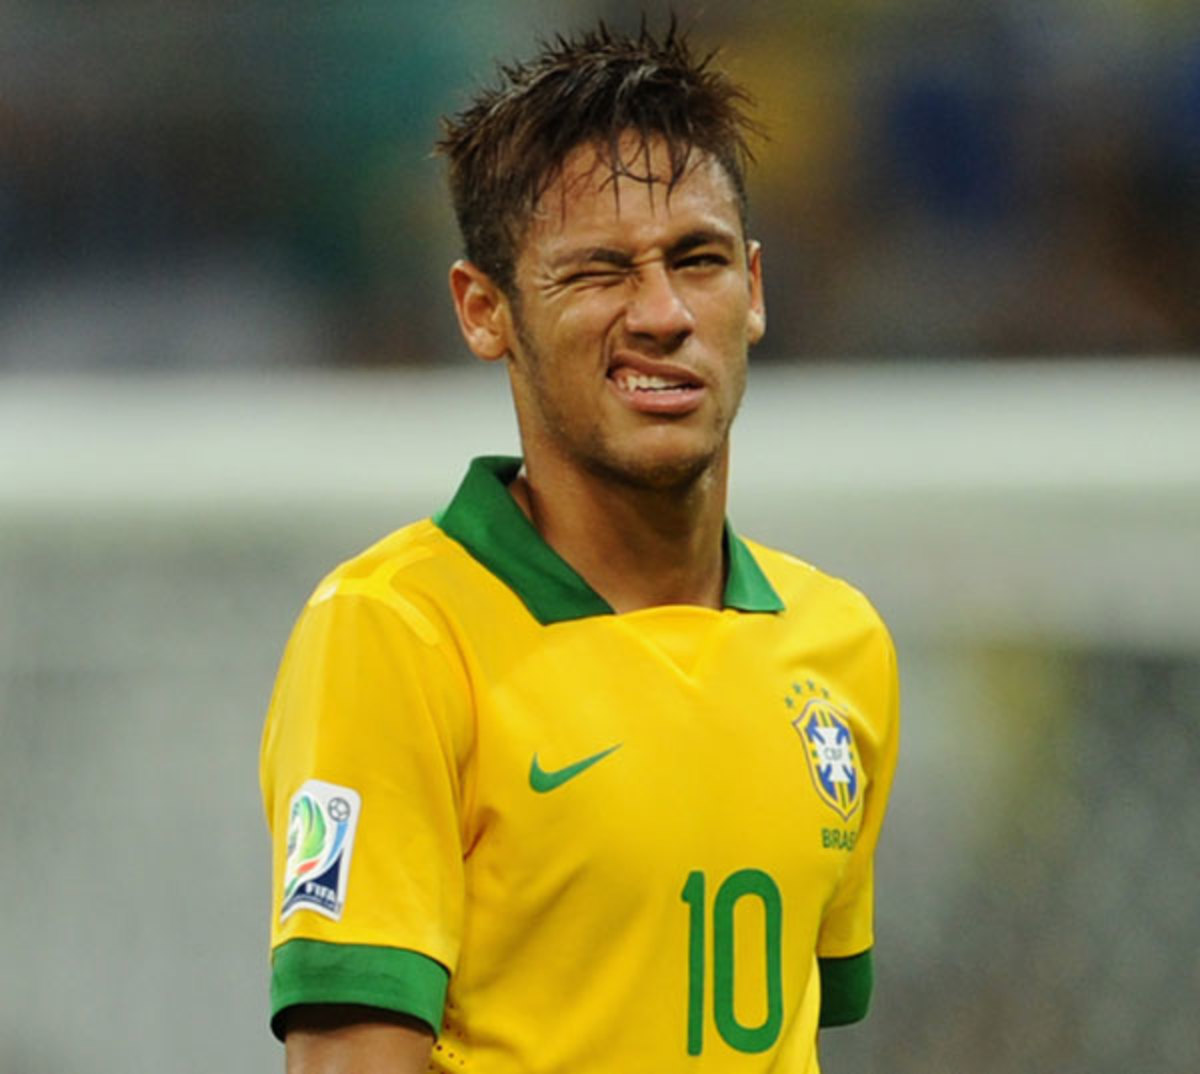 Shaun Botterill - FIFA/FIFA via Getty Images